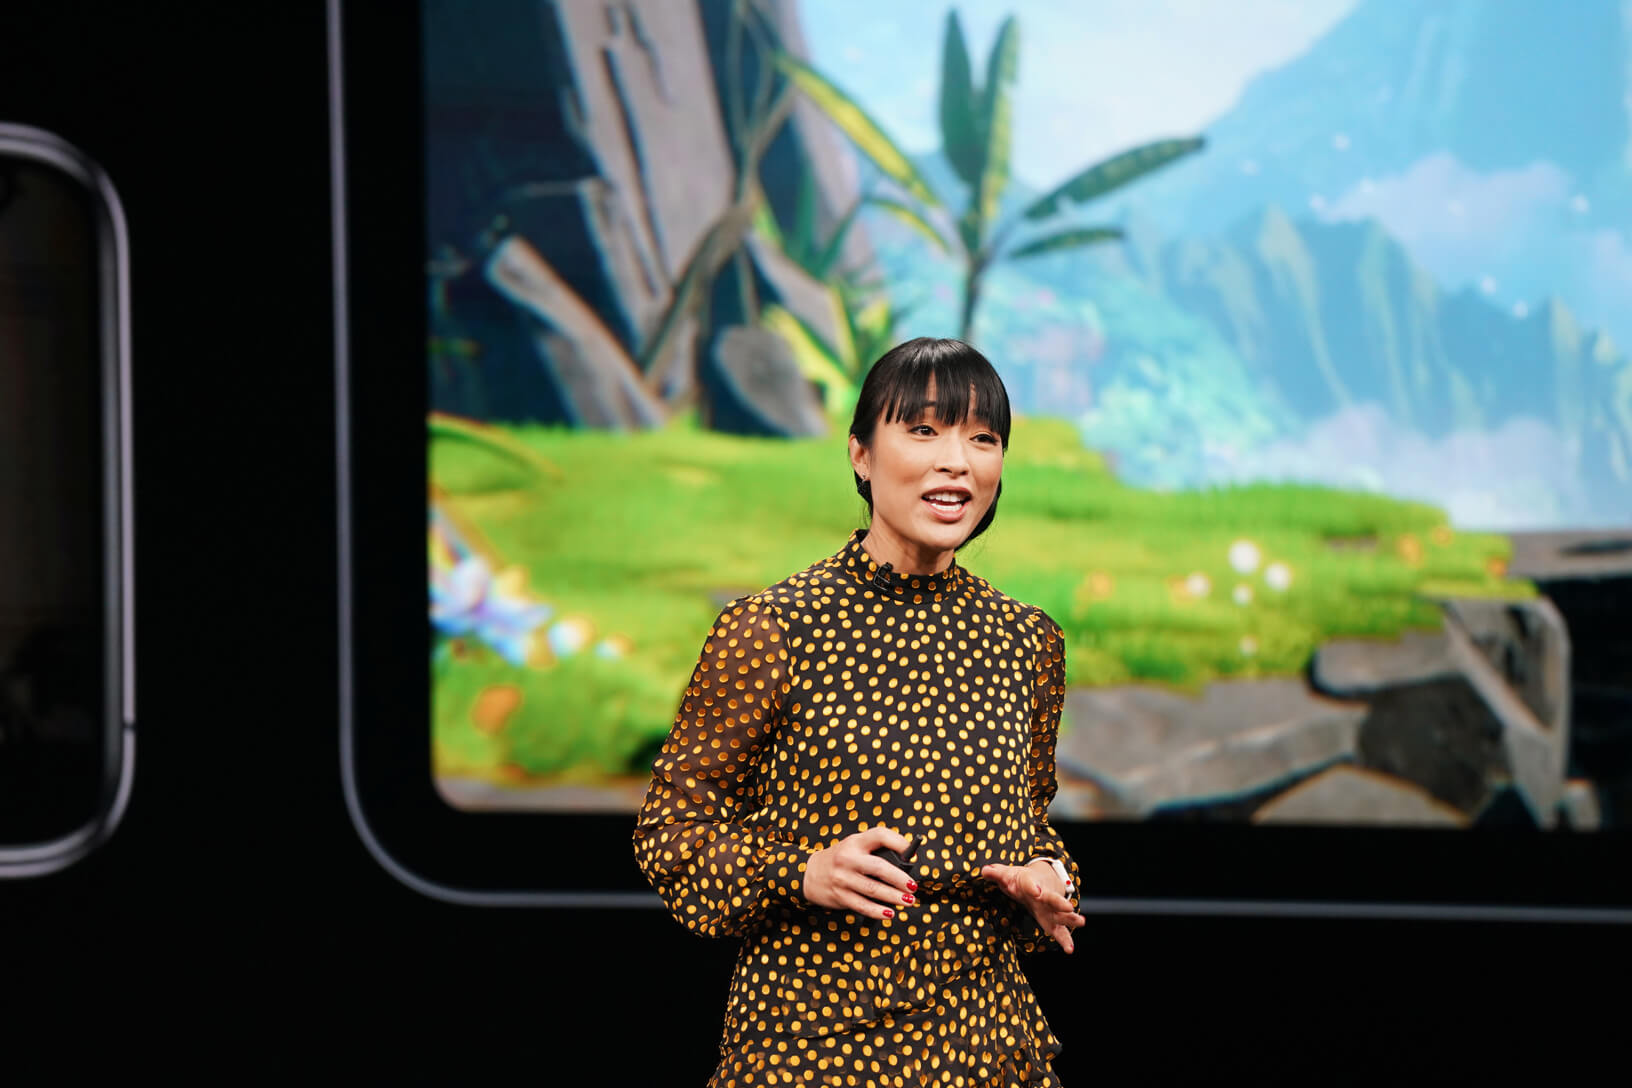 Apples-keynote-event_Ann_Thai_unveils_apple_arcade-03252019